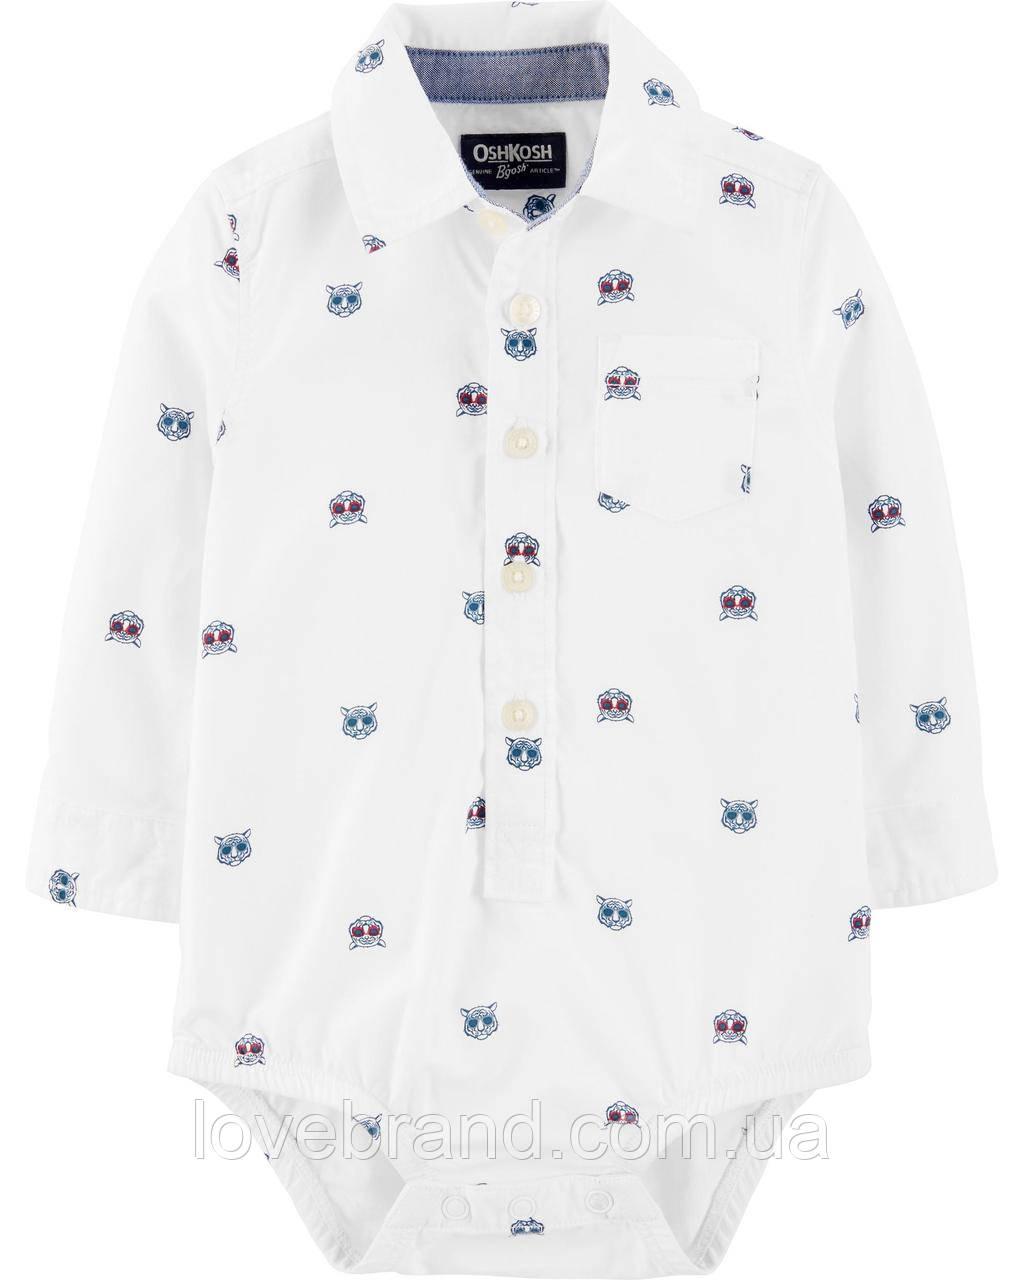 Боди-рубашка для мальчика OshKosh Тигр белая 12 мес/72-78 см